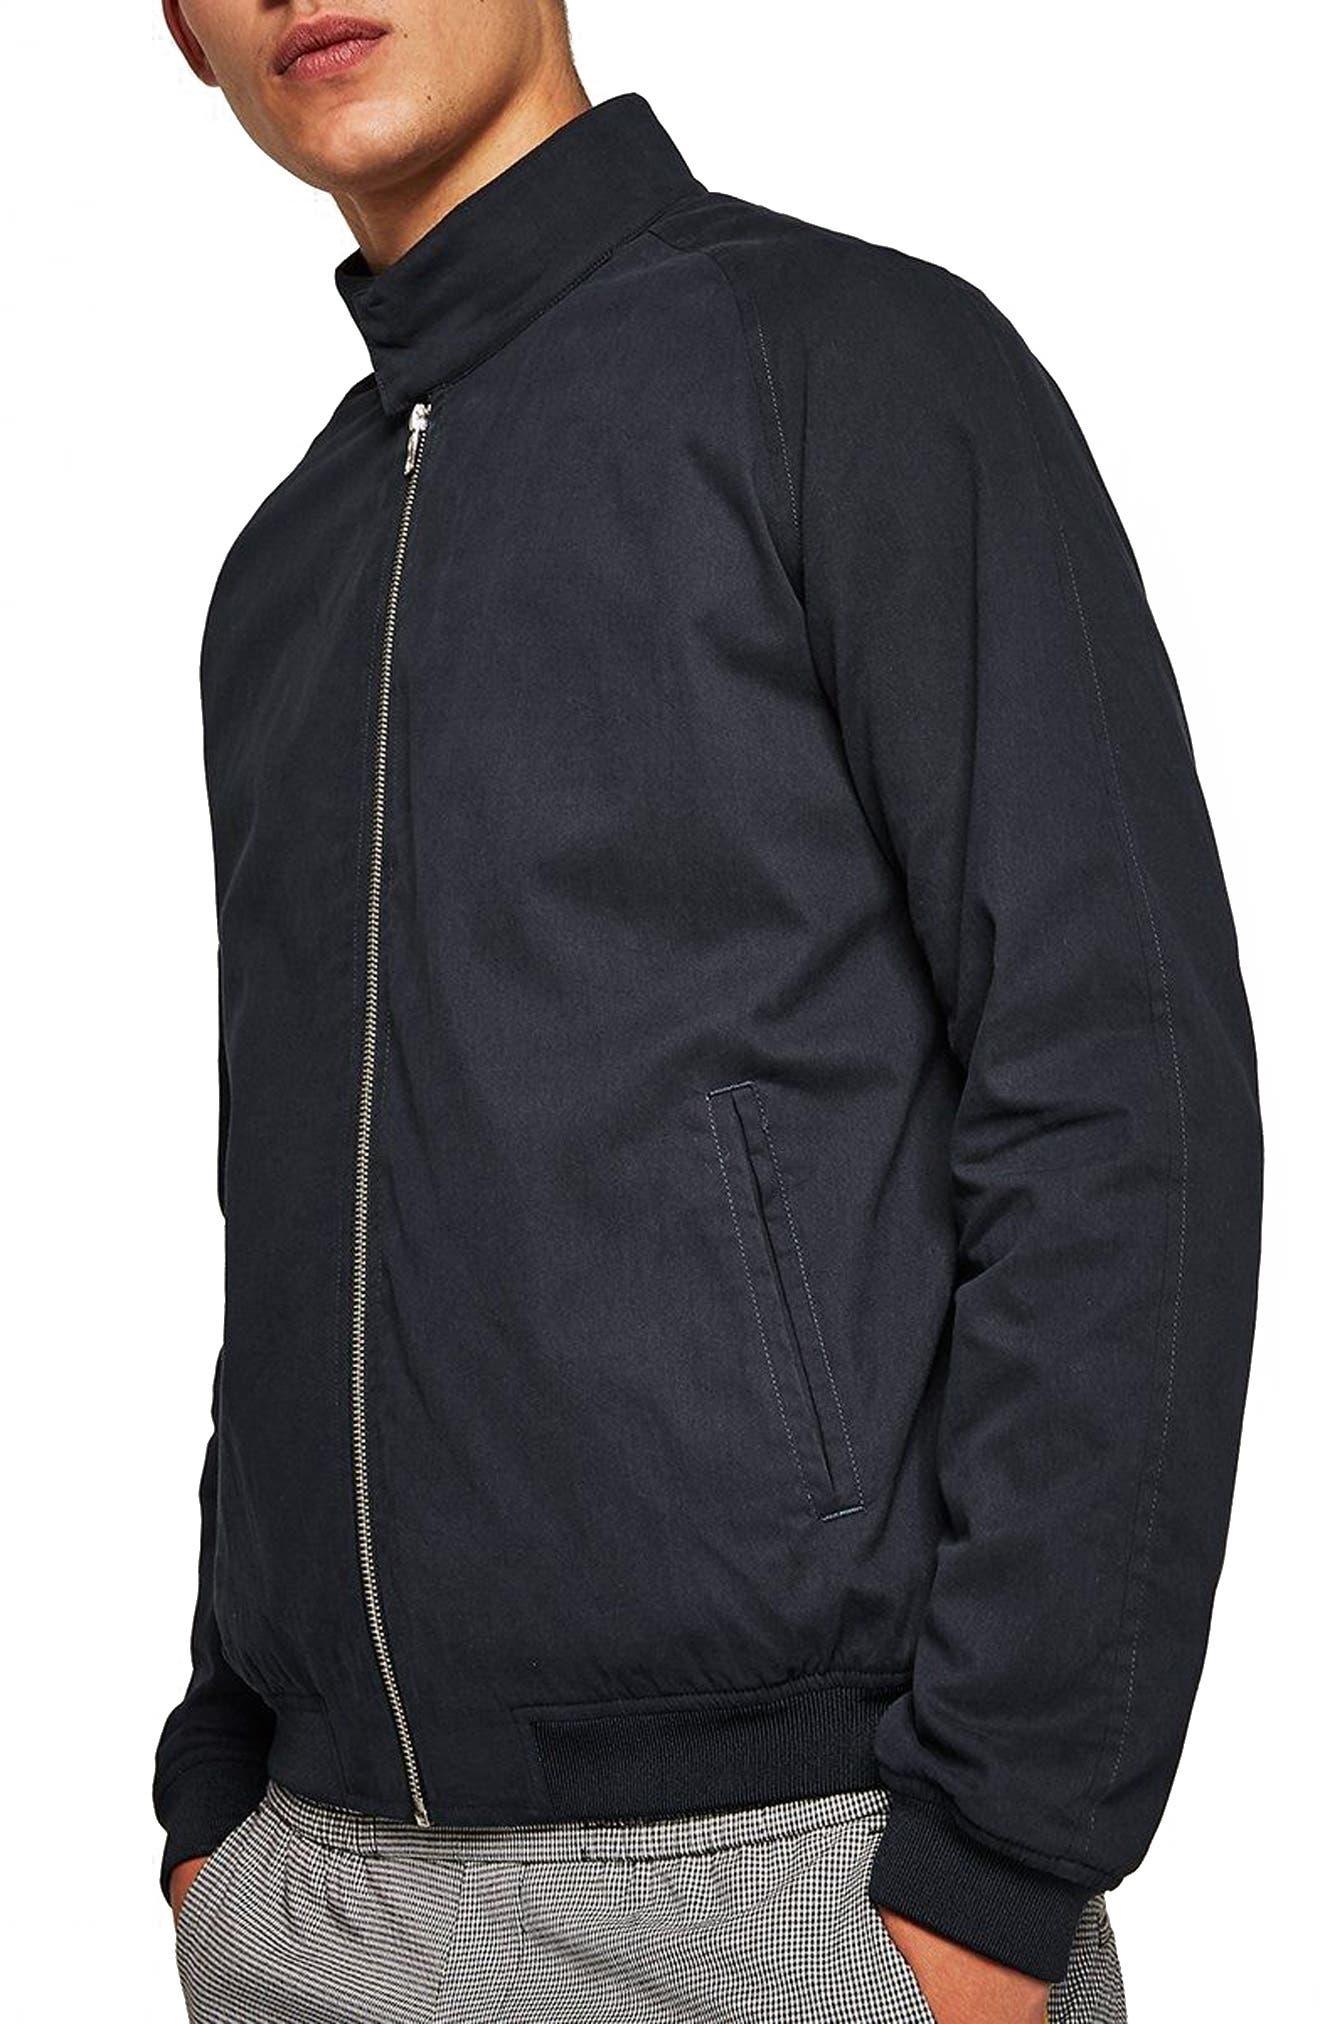 Harrington Jacket,                             Main thumbnail 1, color,                             DARK BLUE